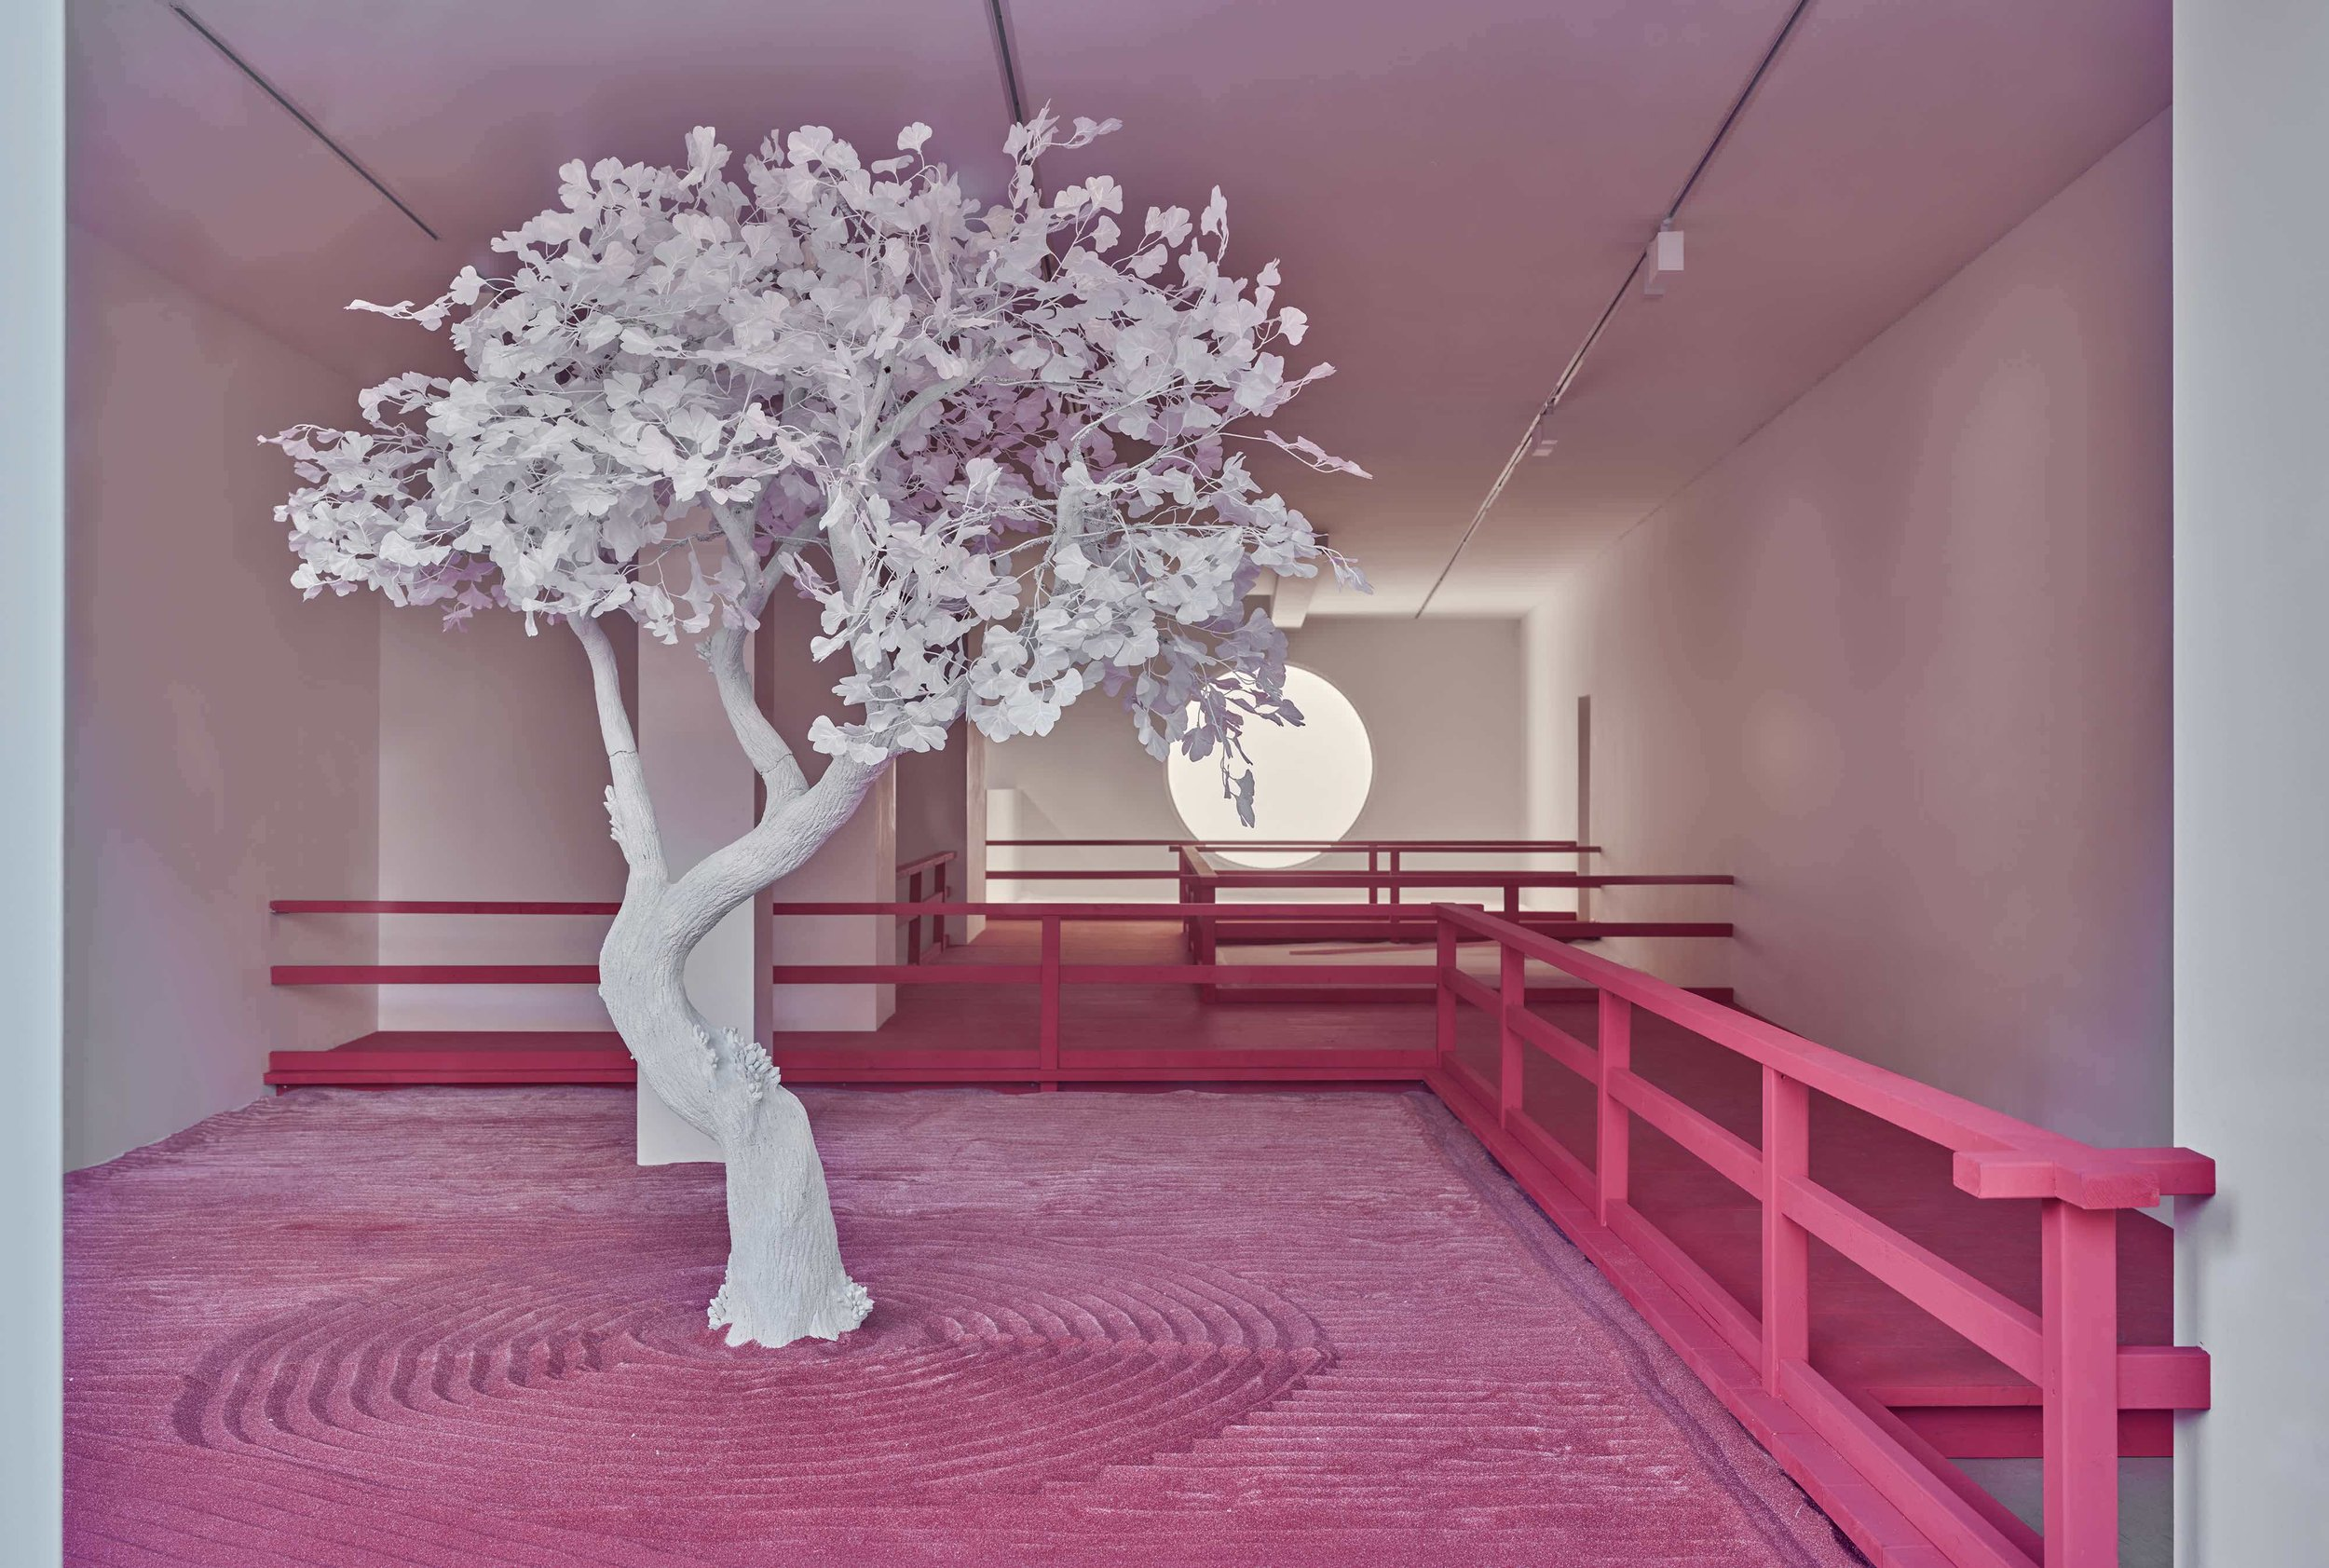 daniel arsham, lunar garden alla galleria ron mandos